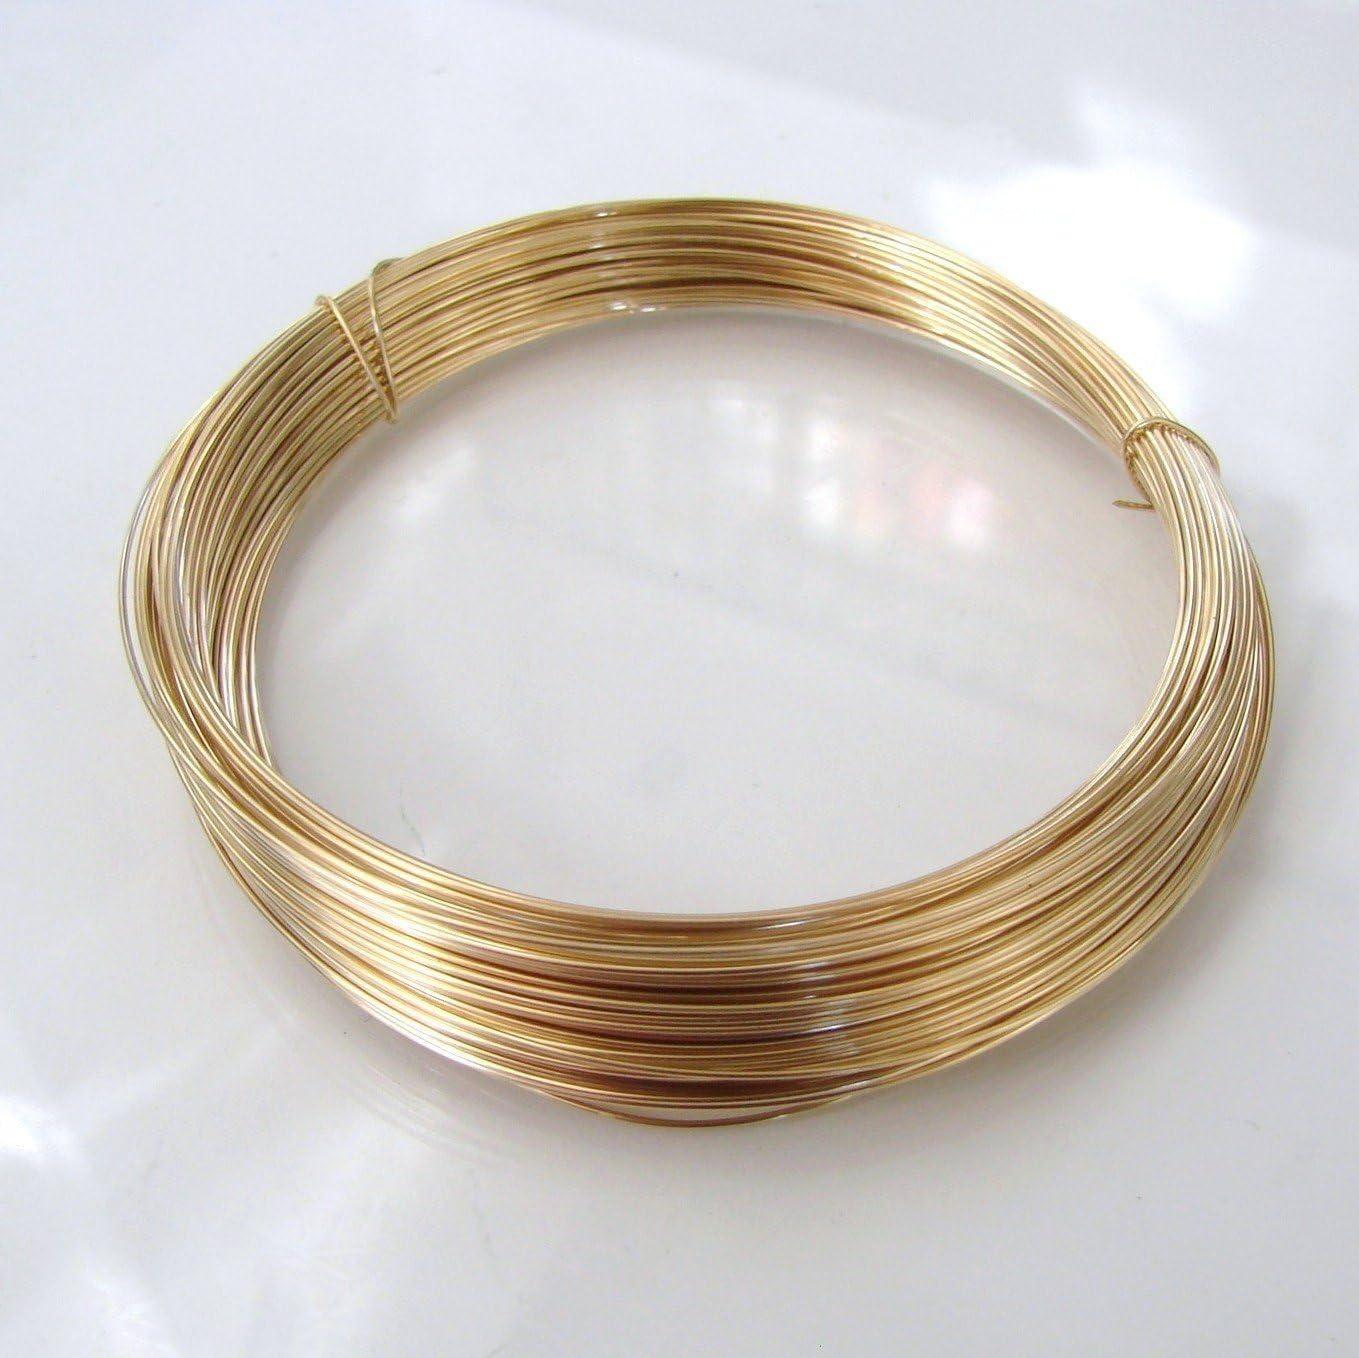 18 Gauge Gold Filled Half Hard Half Round Wire 14 K Gold Filled Priced Per Inch